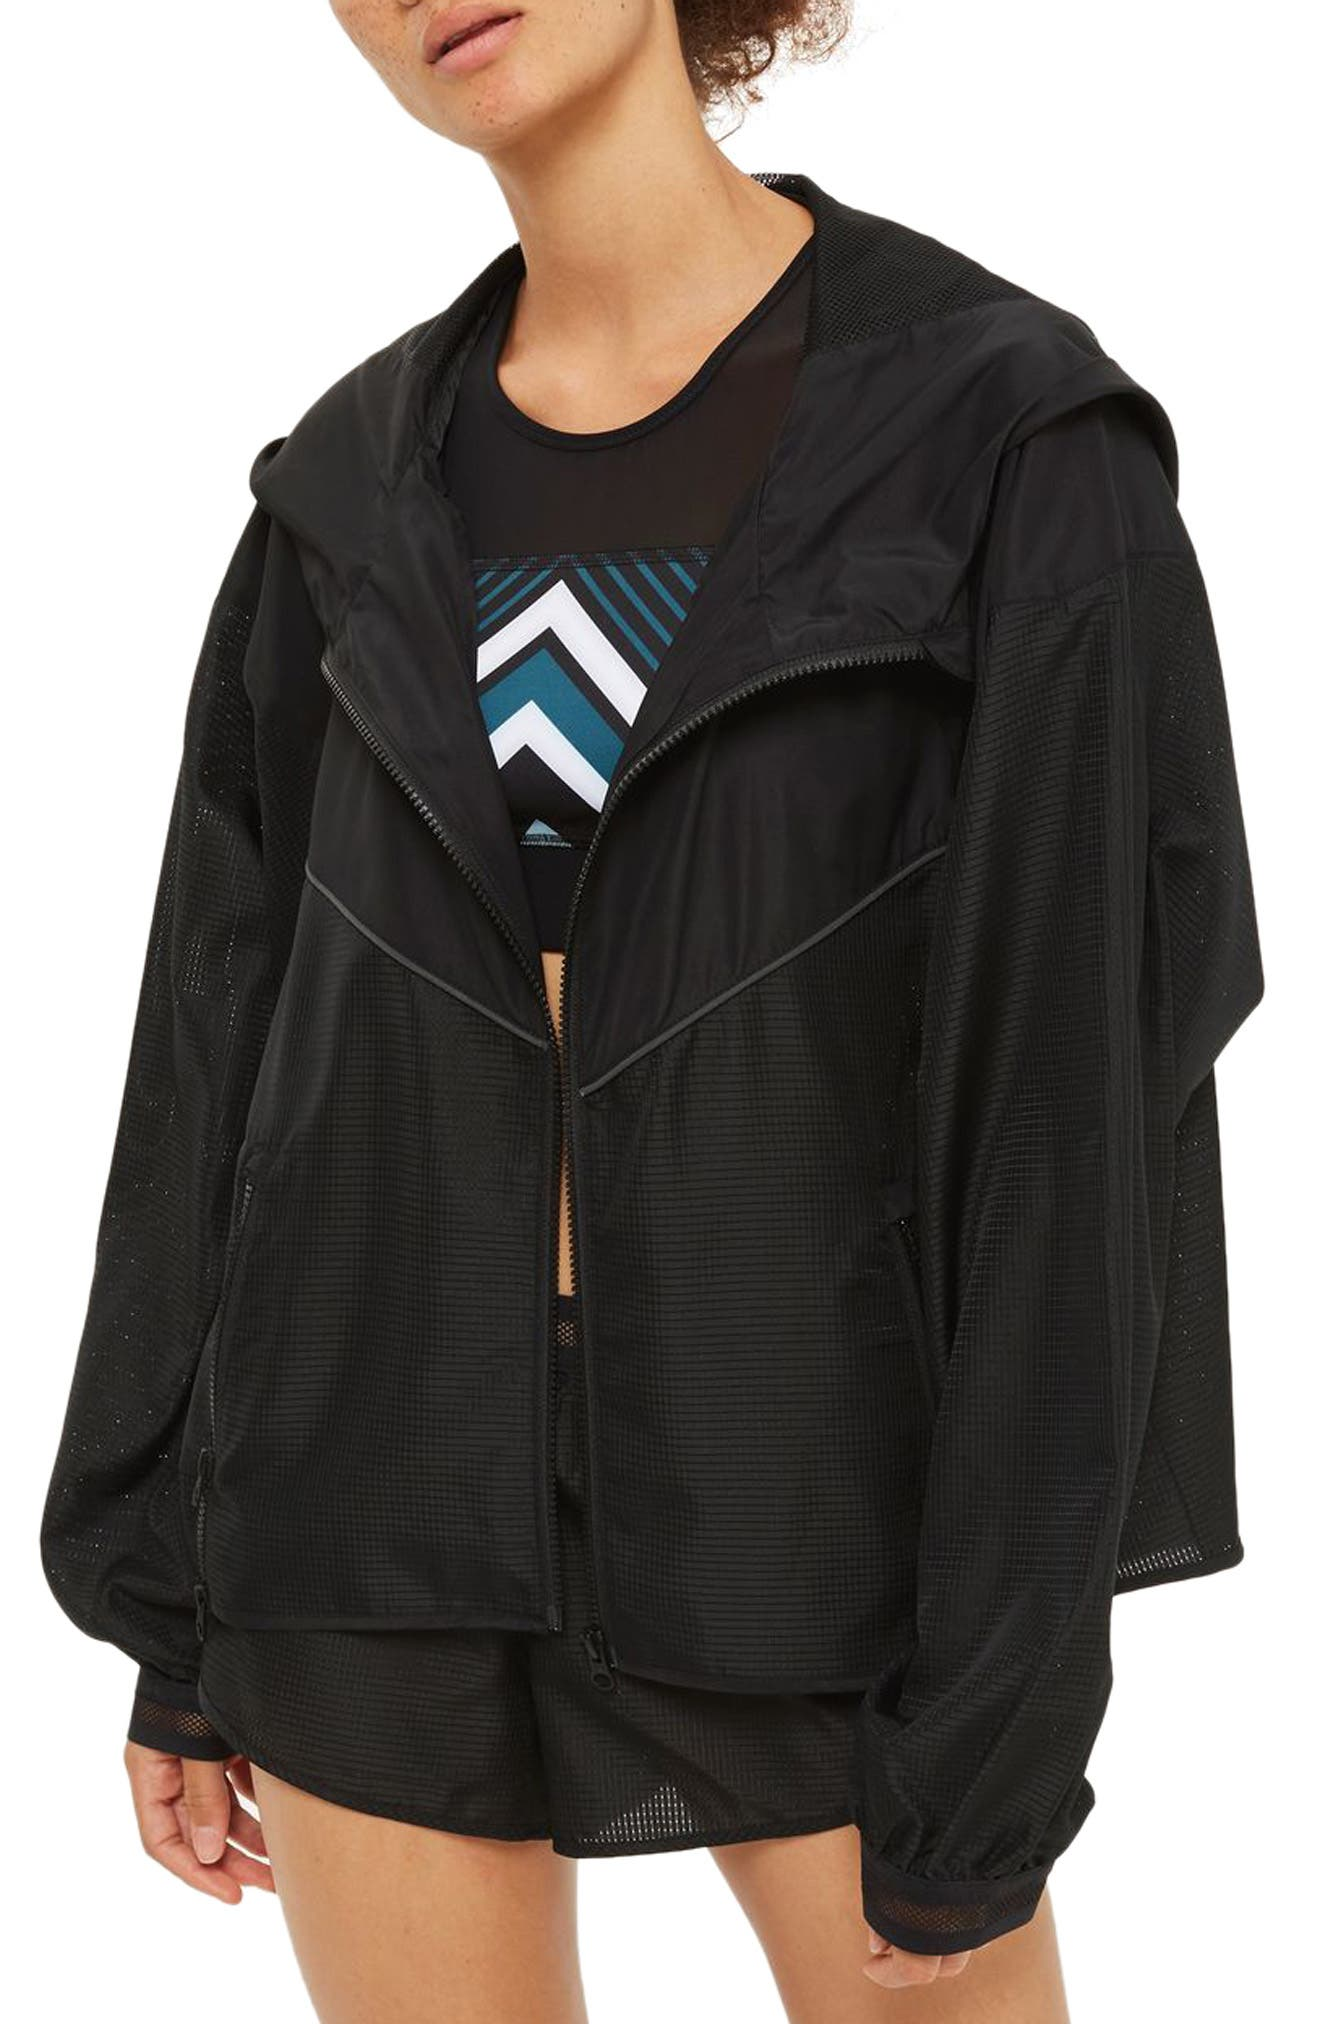 Alternate Image 1 Selected - IVY PARK® Logo Hood Jacket